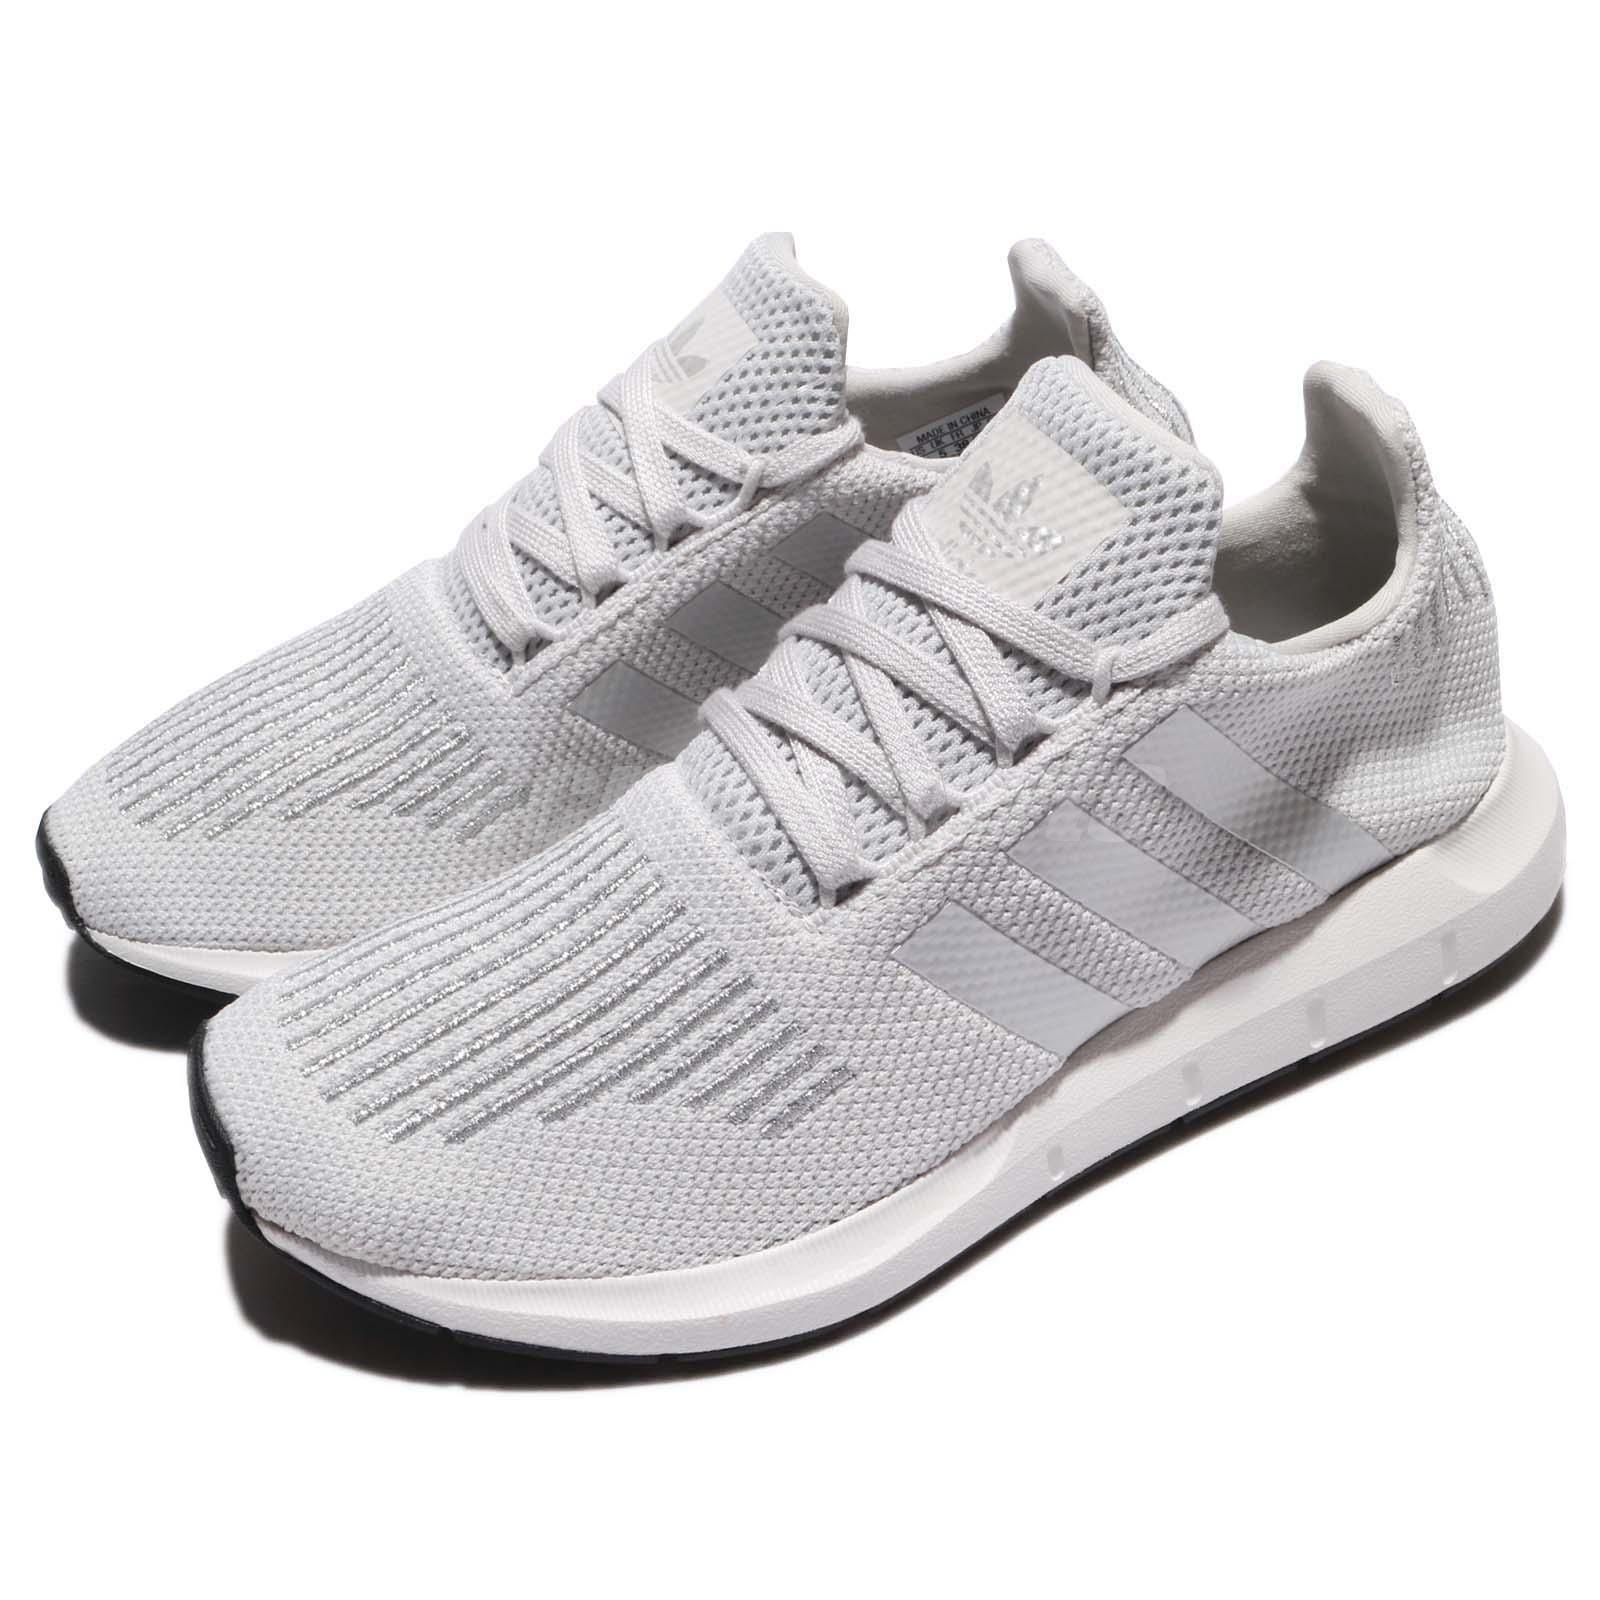 f2bc80b7e7422b adidas Originals Swift Run W Grey Silver Women Running .